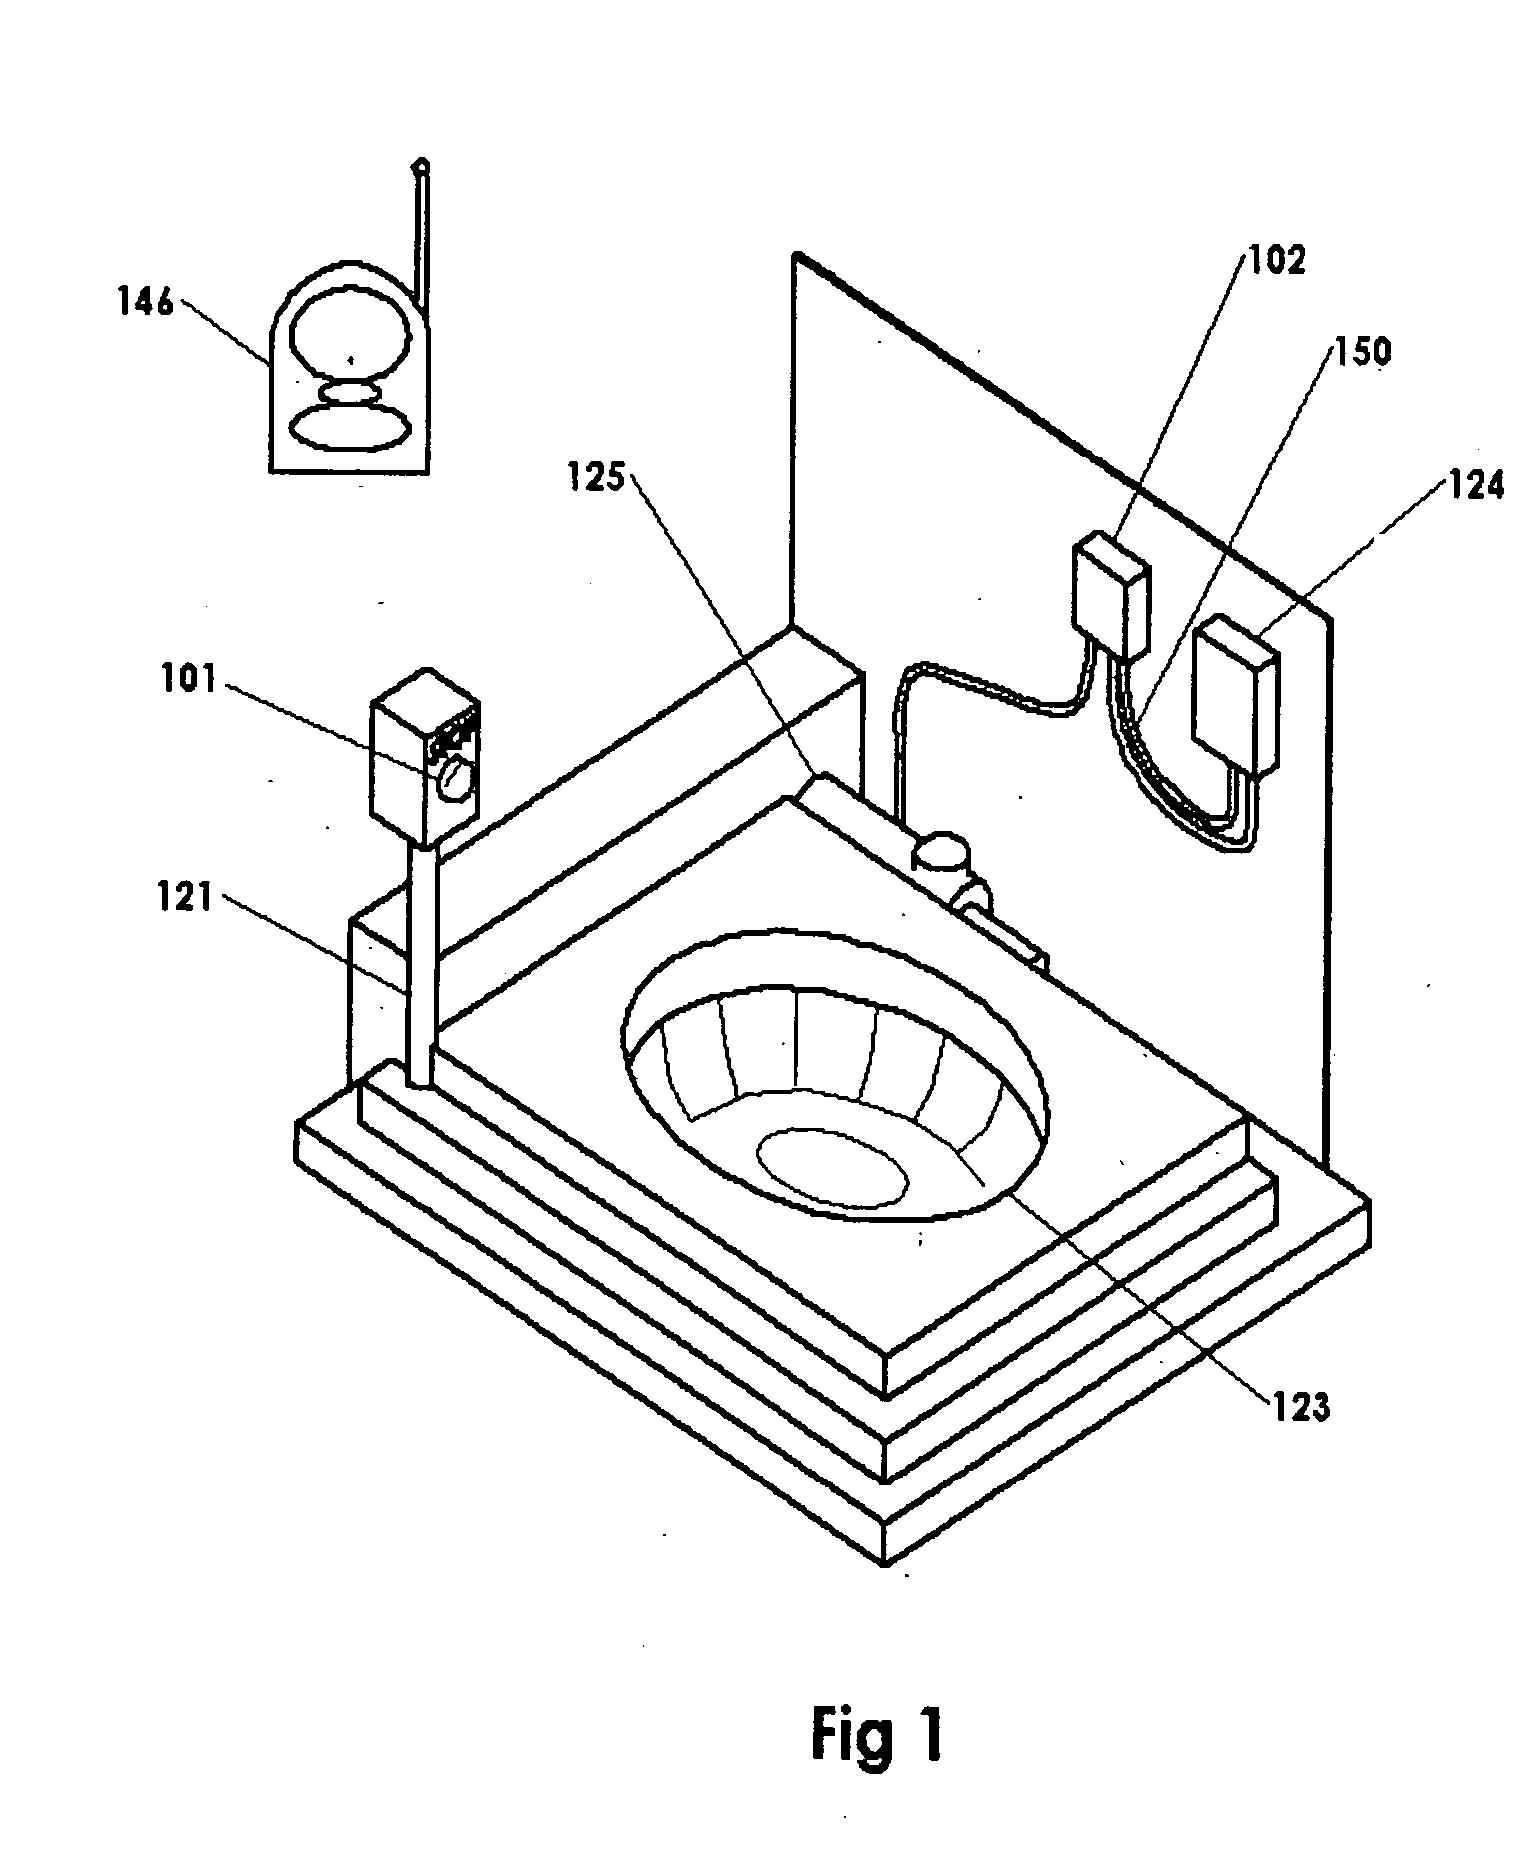 Whirlpool Jacuzzi Hot Tub Wiring Diagrams, Whirlpool, Get